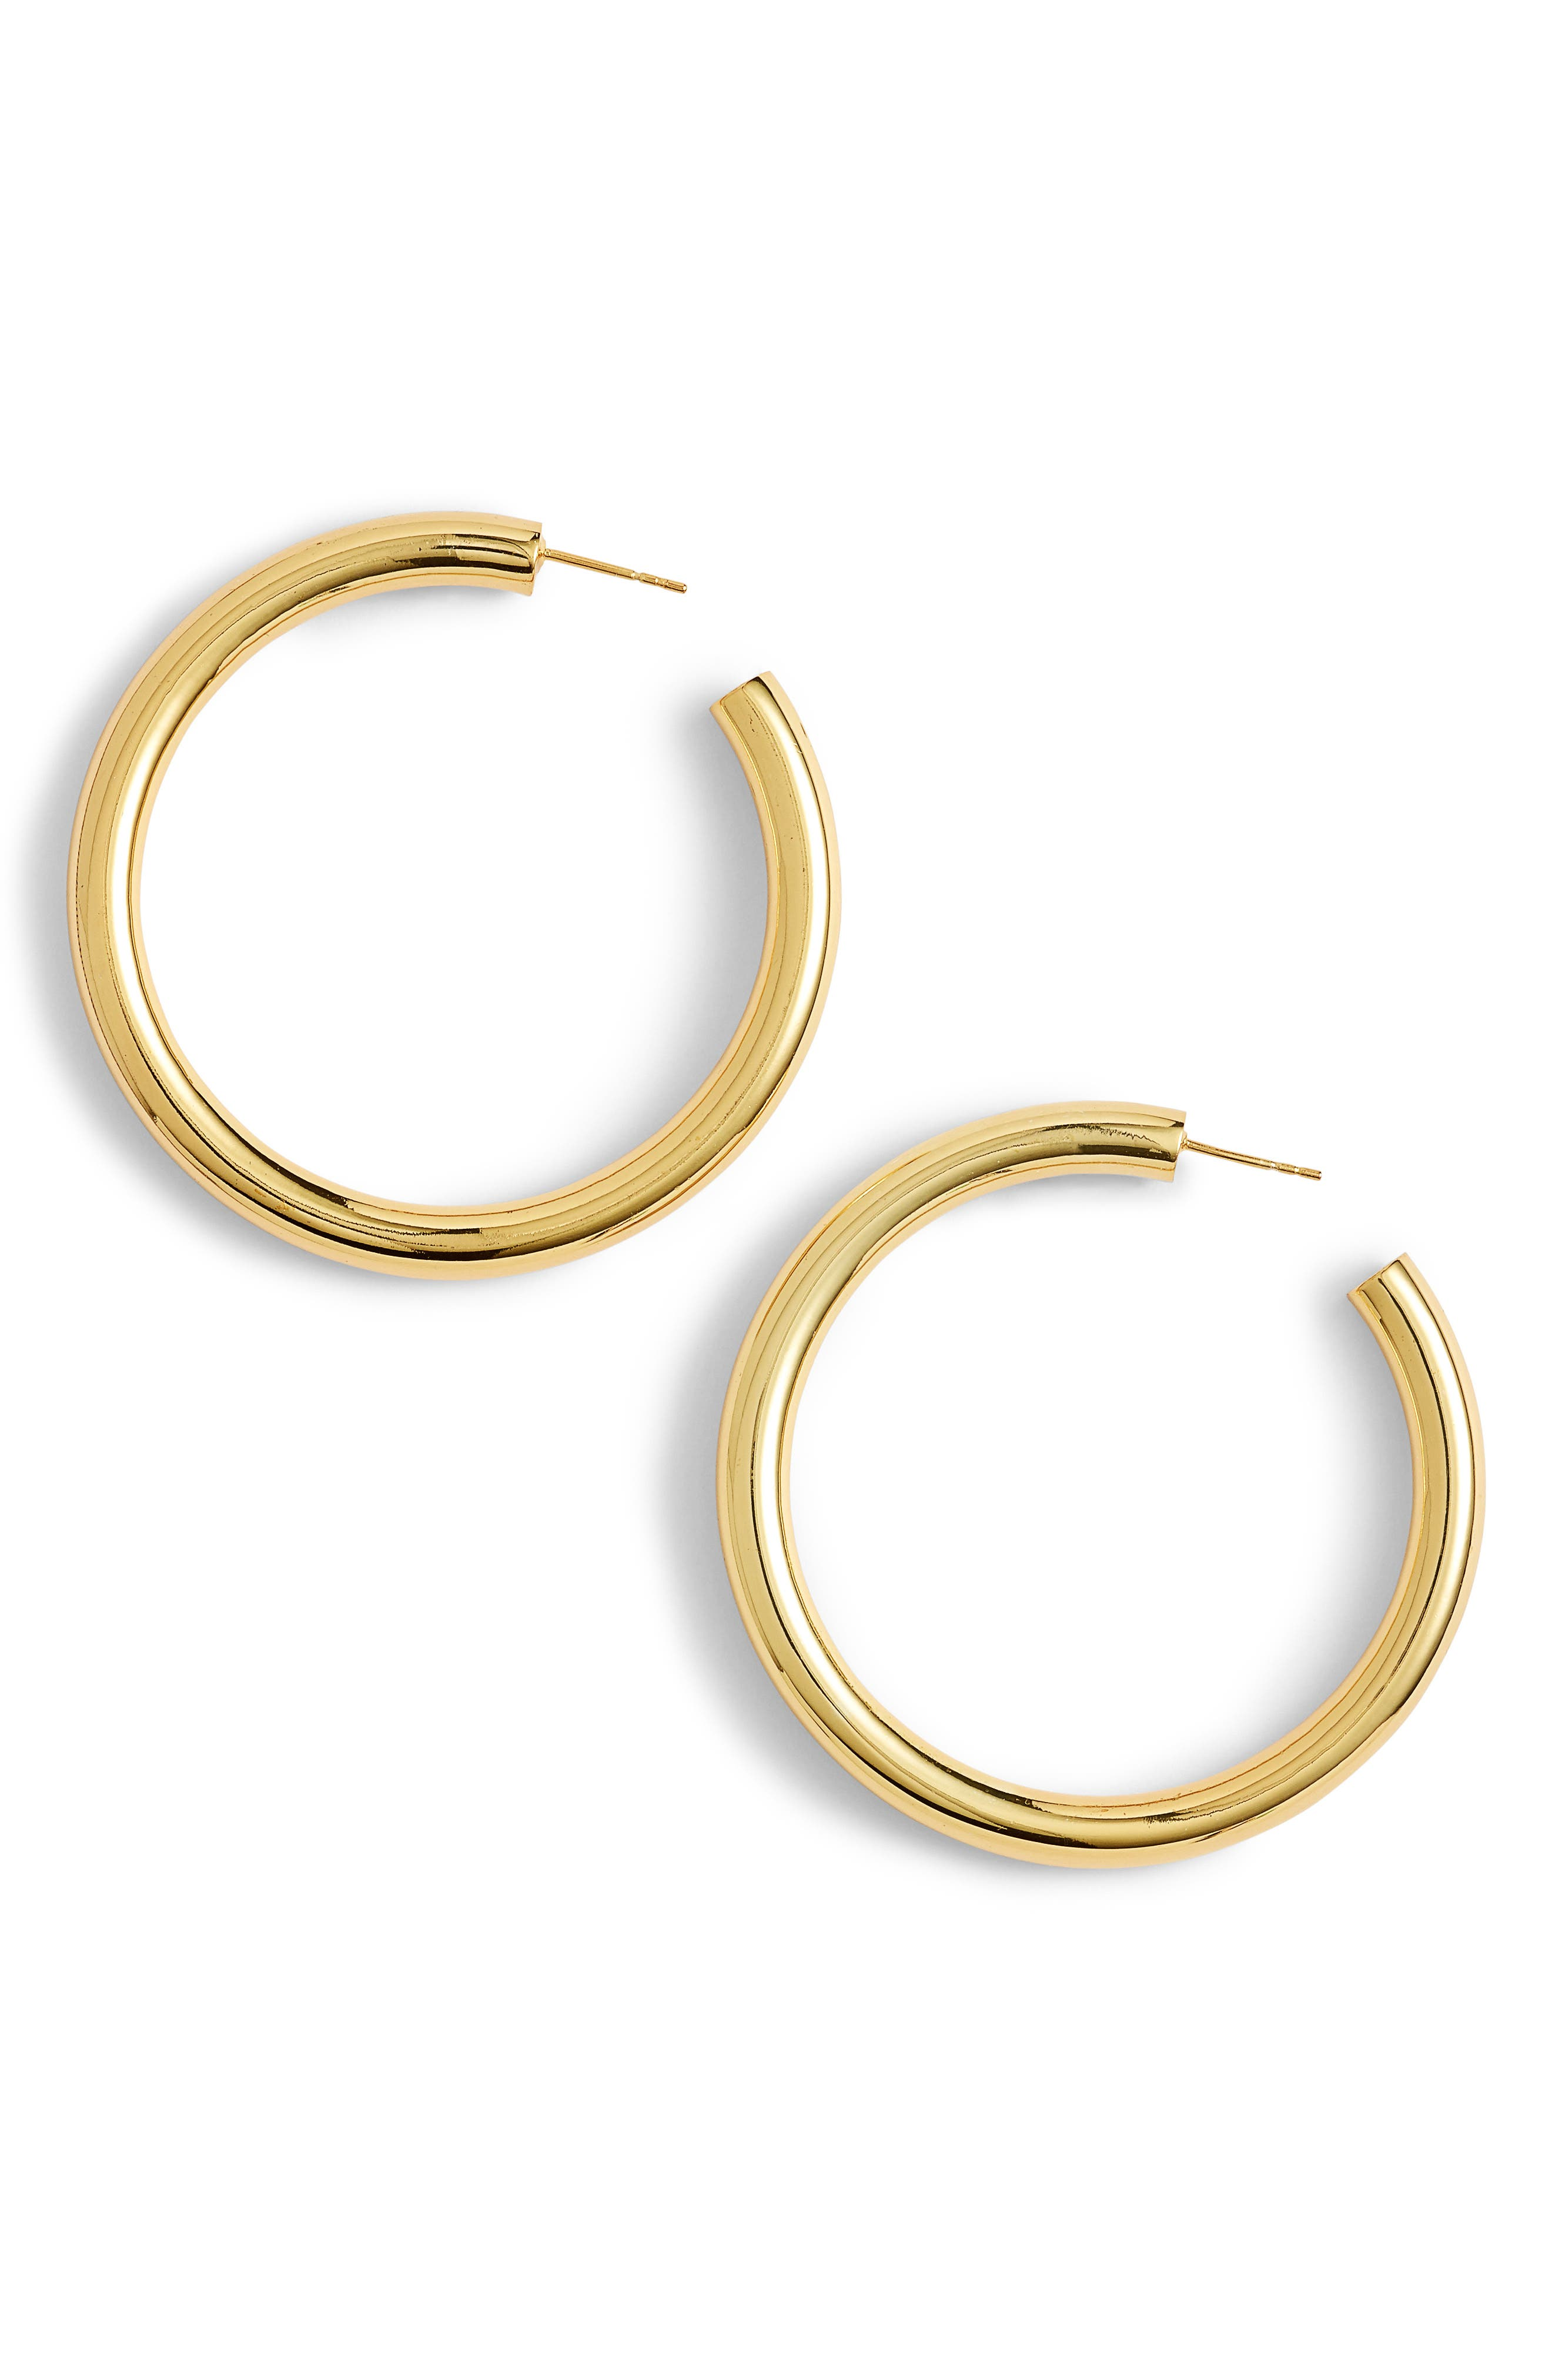 Hollow Hoop Earrings,                             Main thumbnail 1, color,                             GOLD